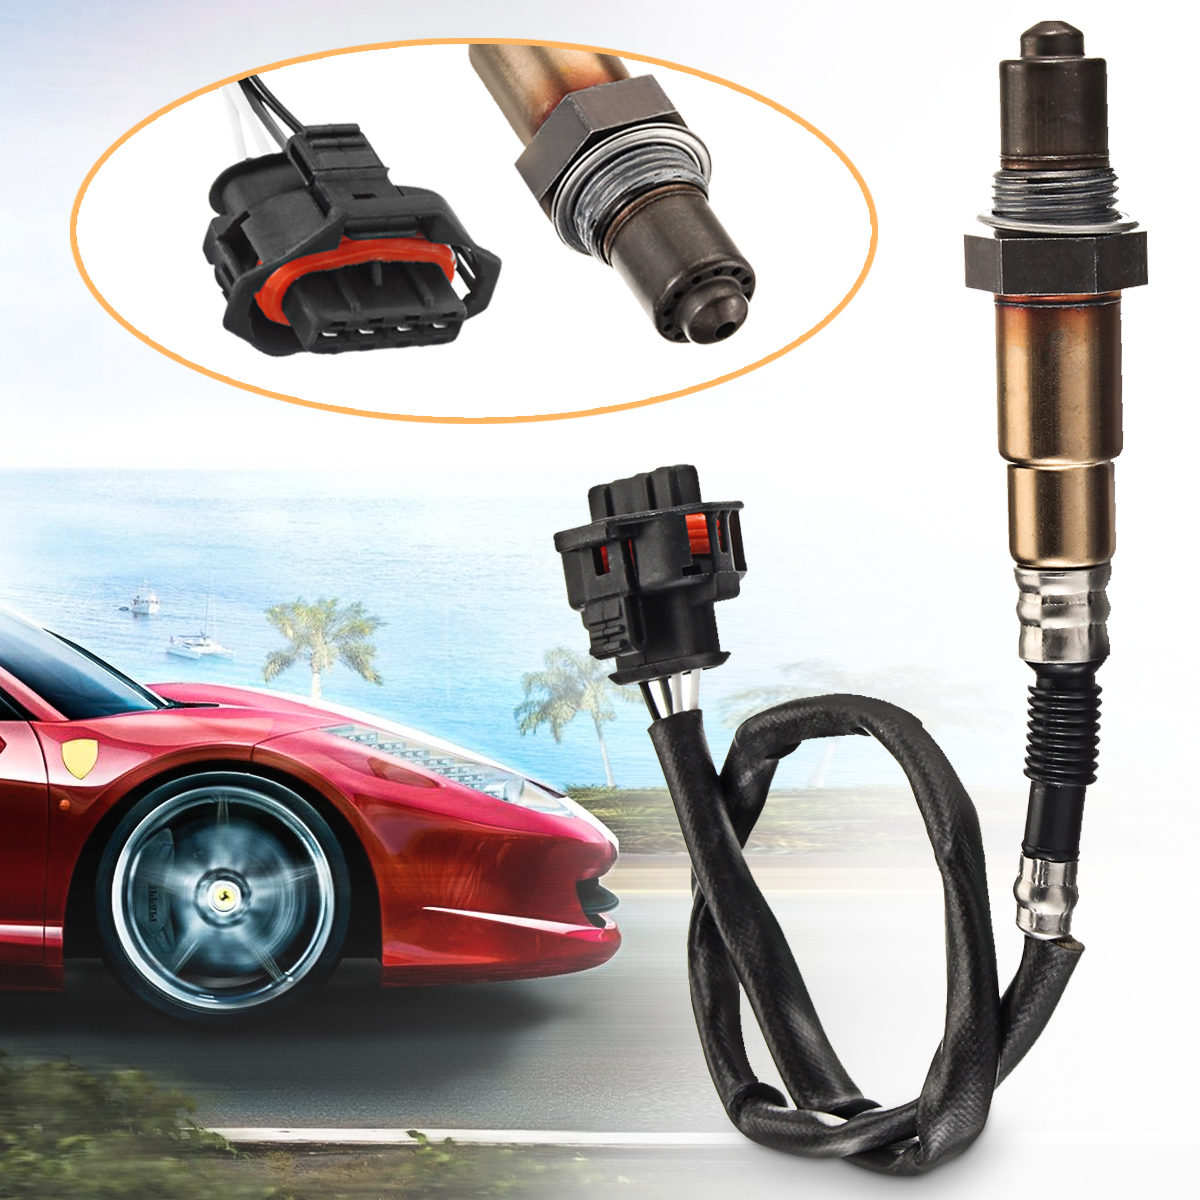 4 Wires Lambda Probe Connector O2 Oxygen Sensor 55555625 Wideband Oxygen Sensor For 06-16 Opel Corsa C D 1.0 1.2 1.4 Front Rear